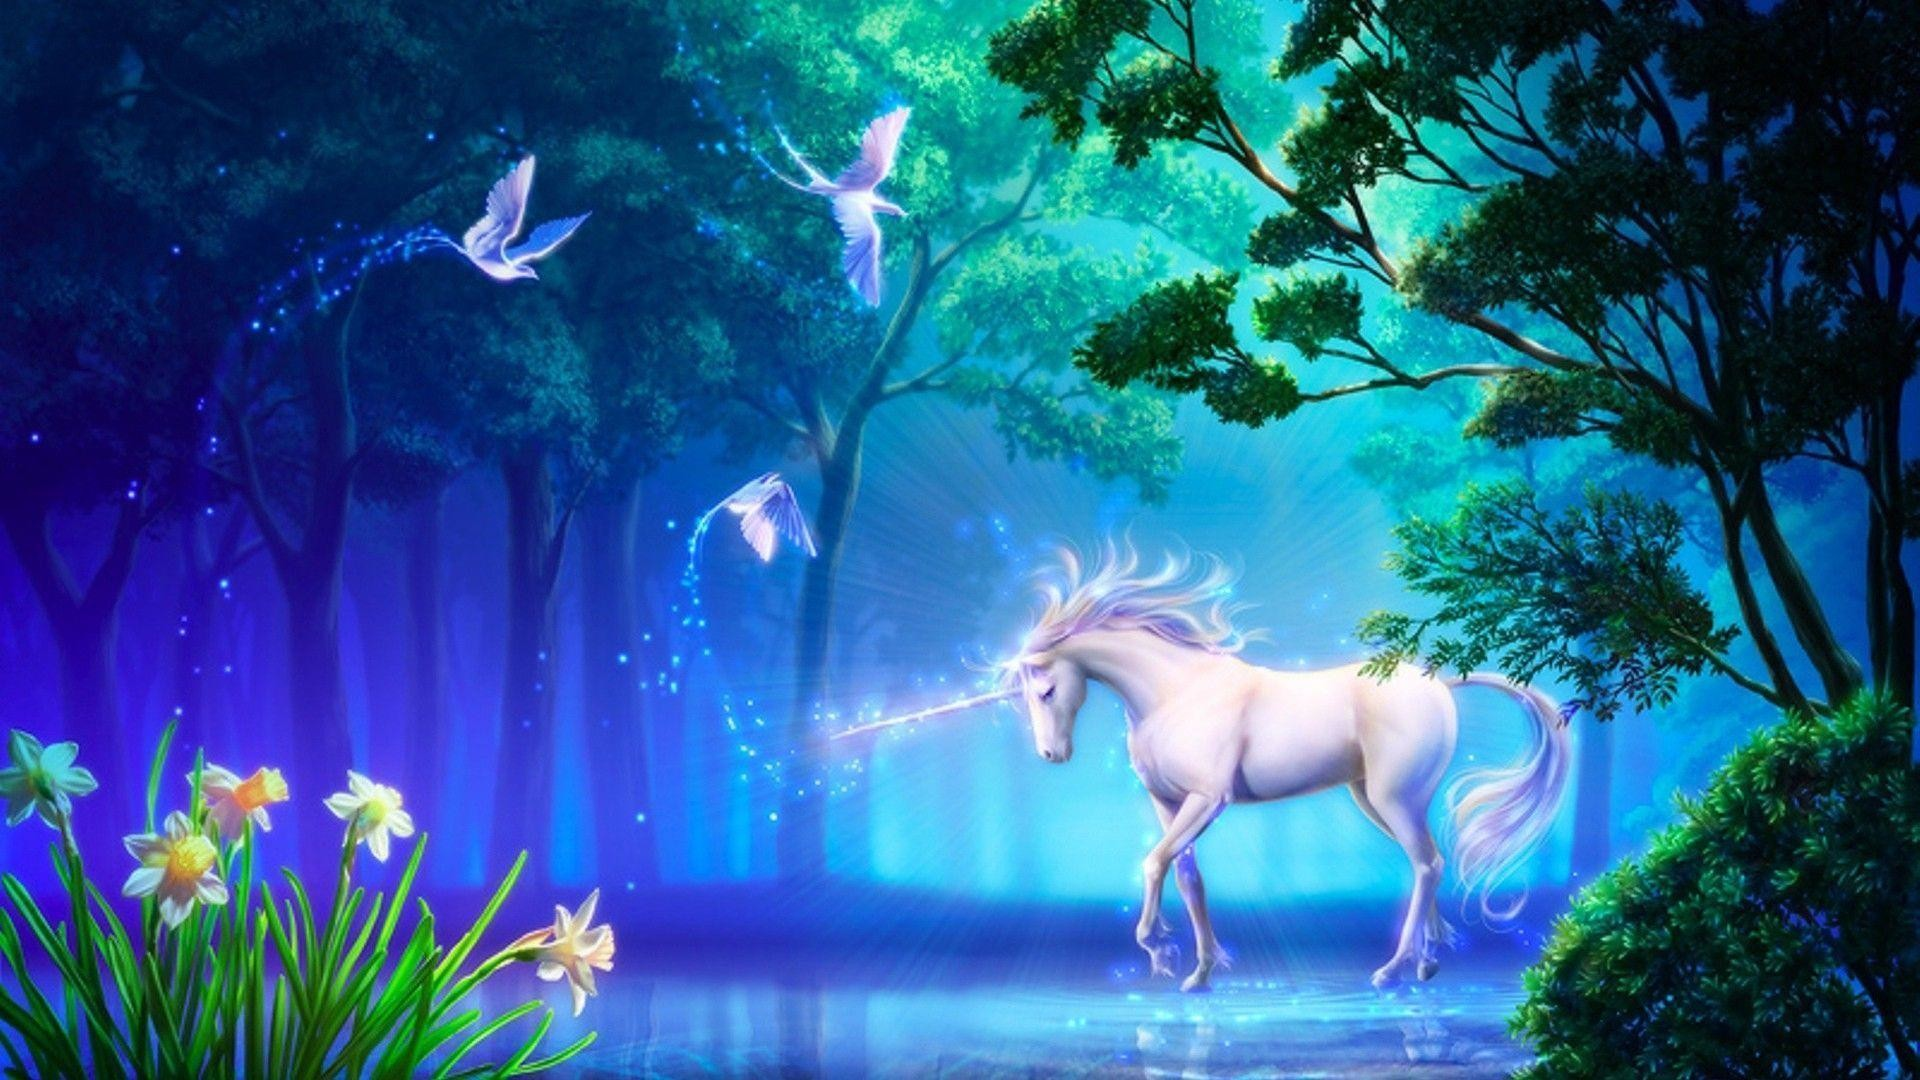 Unicorn Desktop Wallpaper - Unicorn In A Magic Forest , HD Wallpaper & Backgrounds